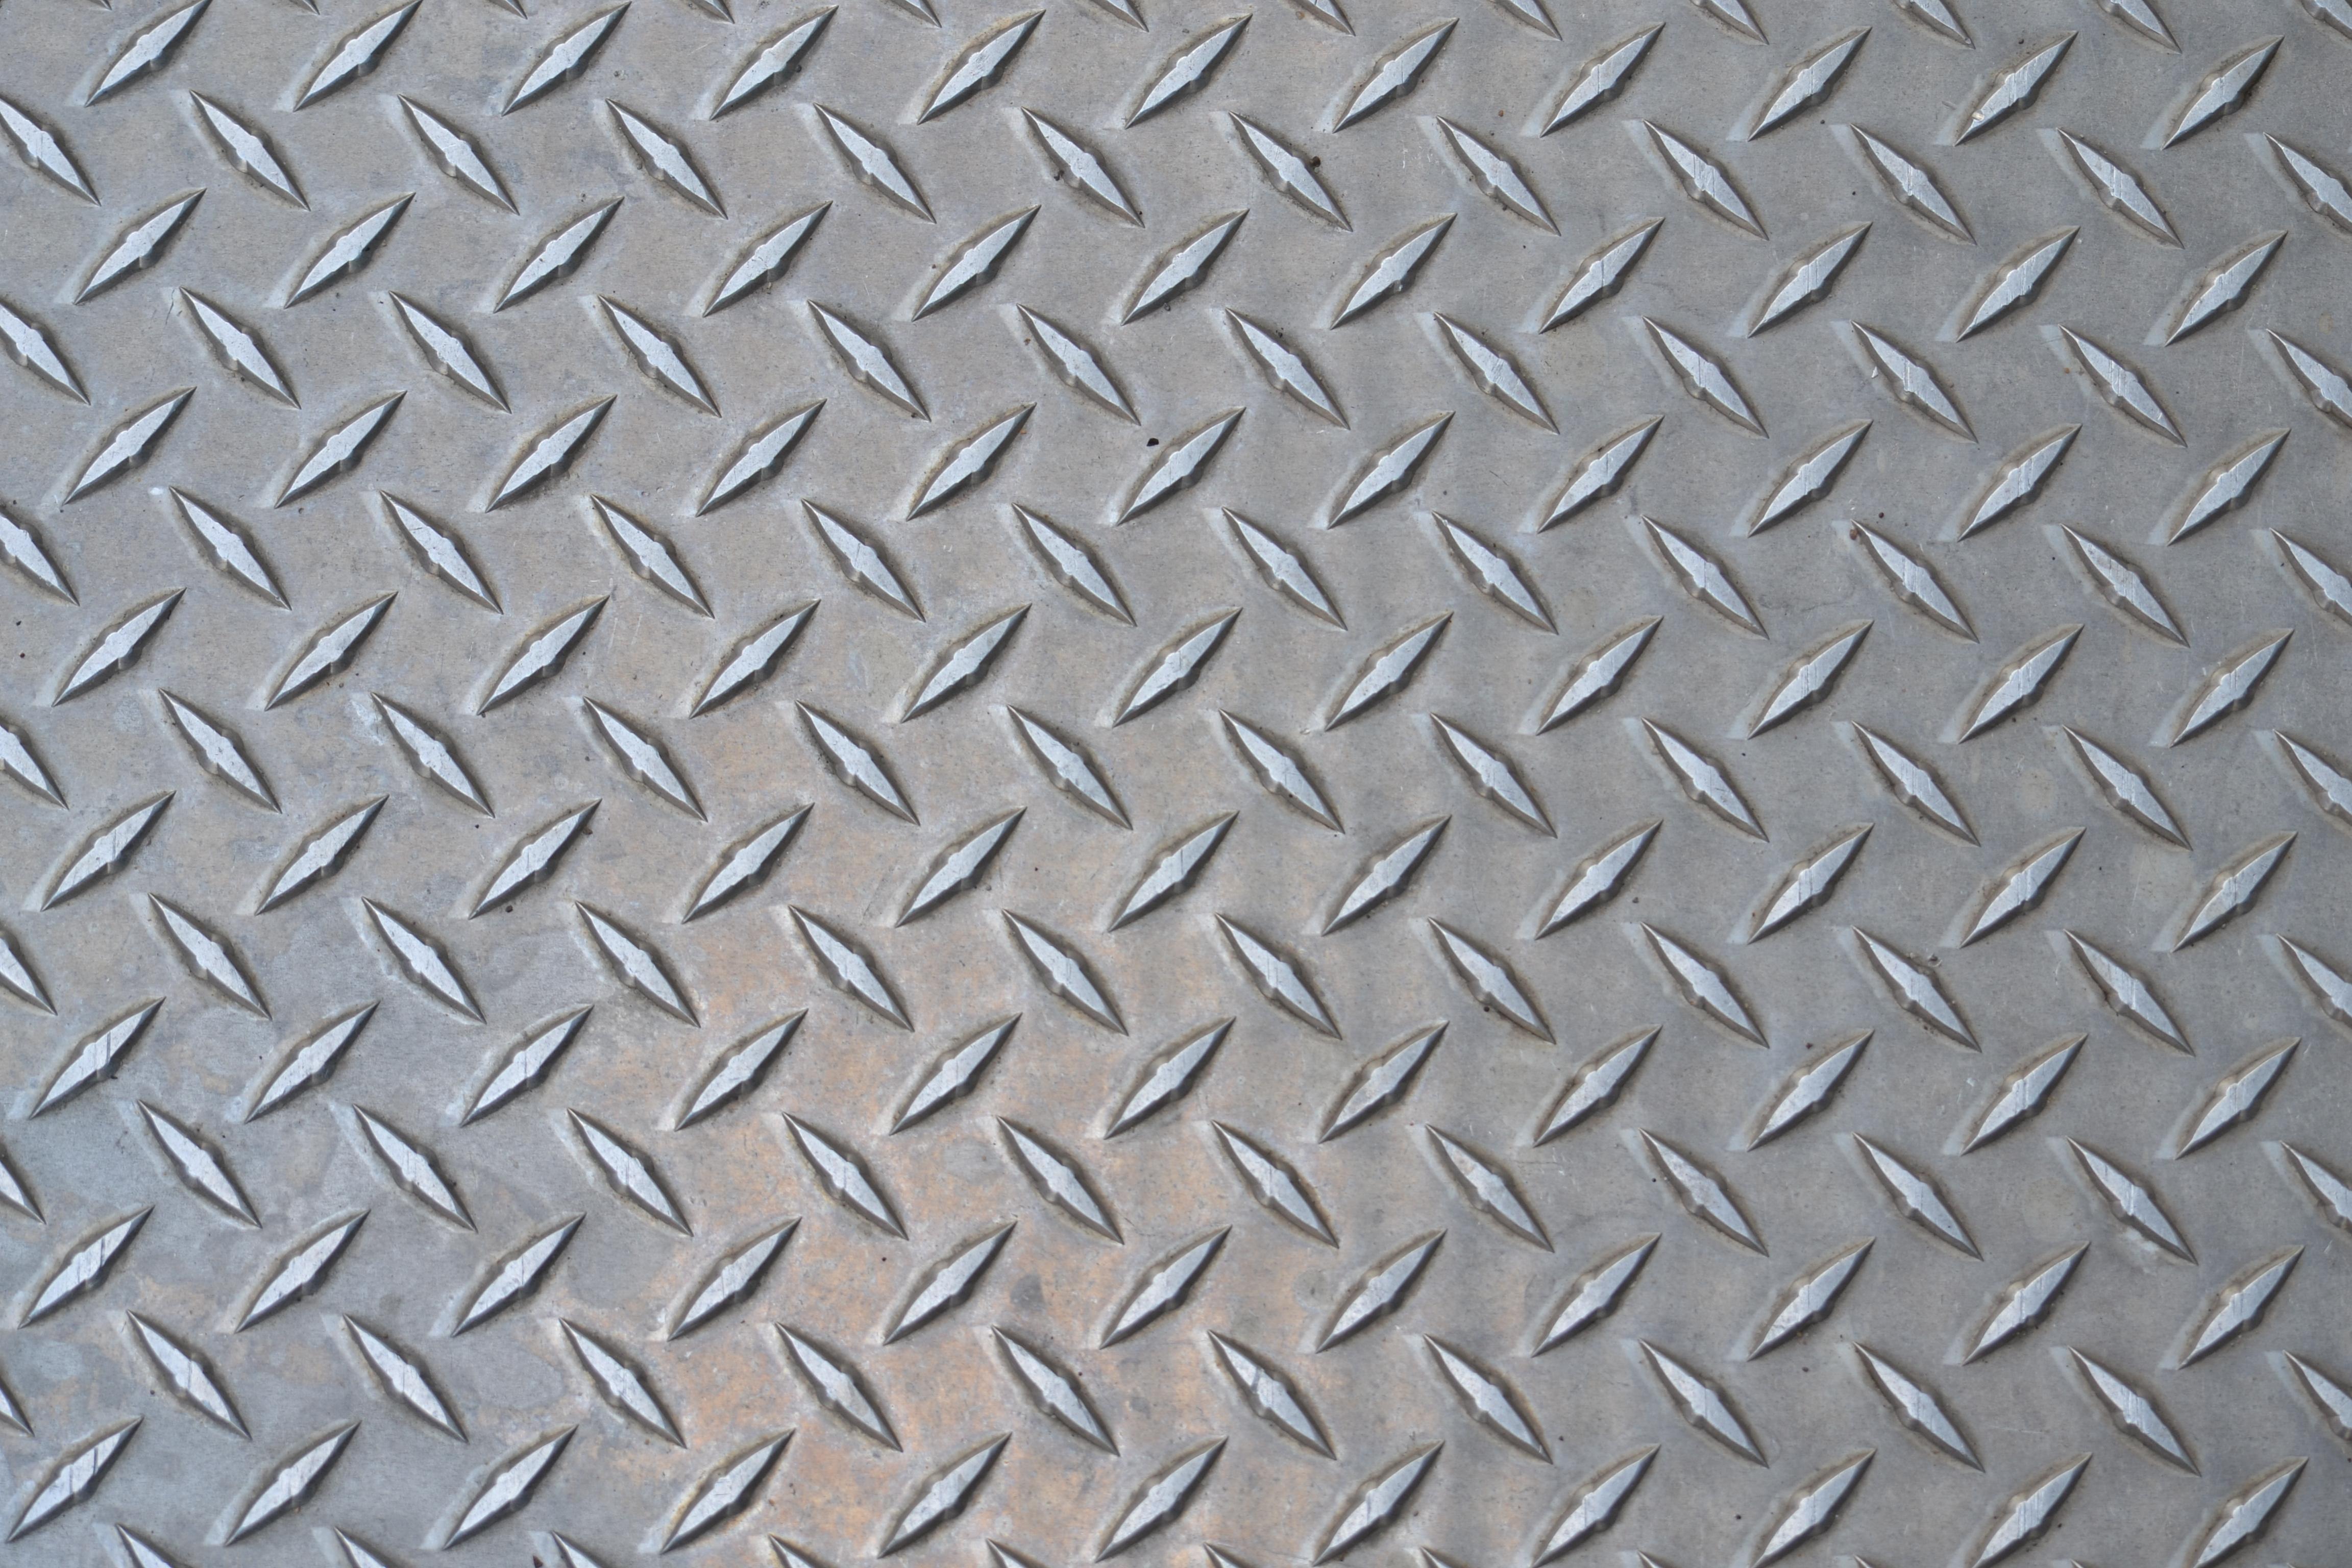 Diamond Plate Texture by LManuel47 on DeviantArt